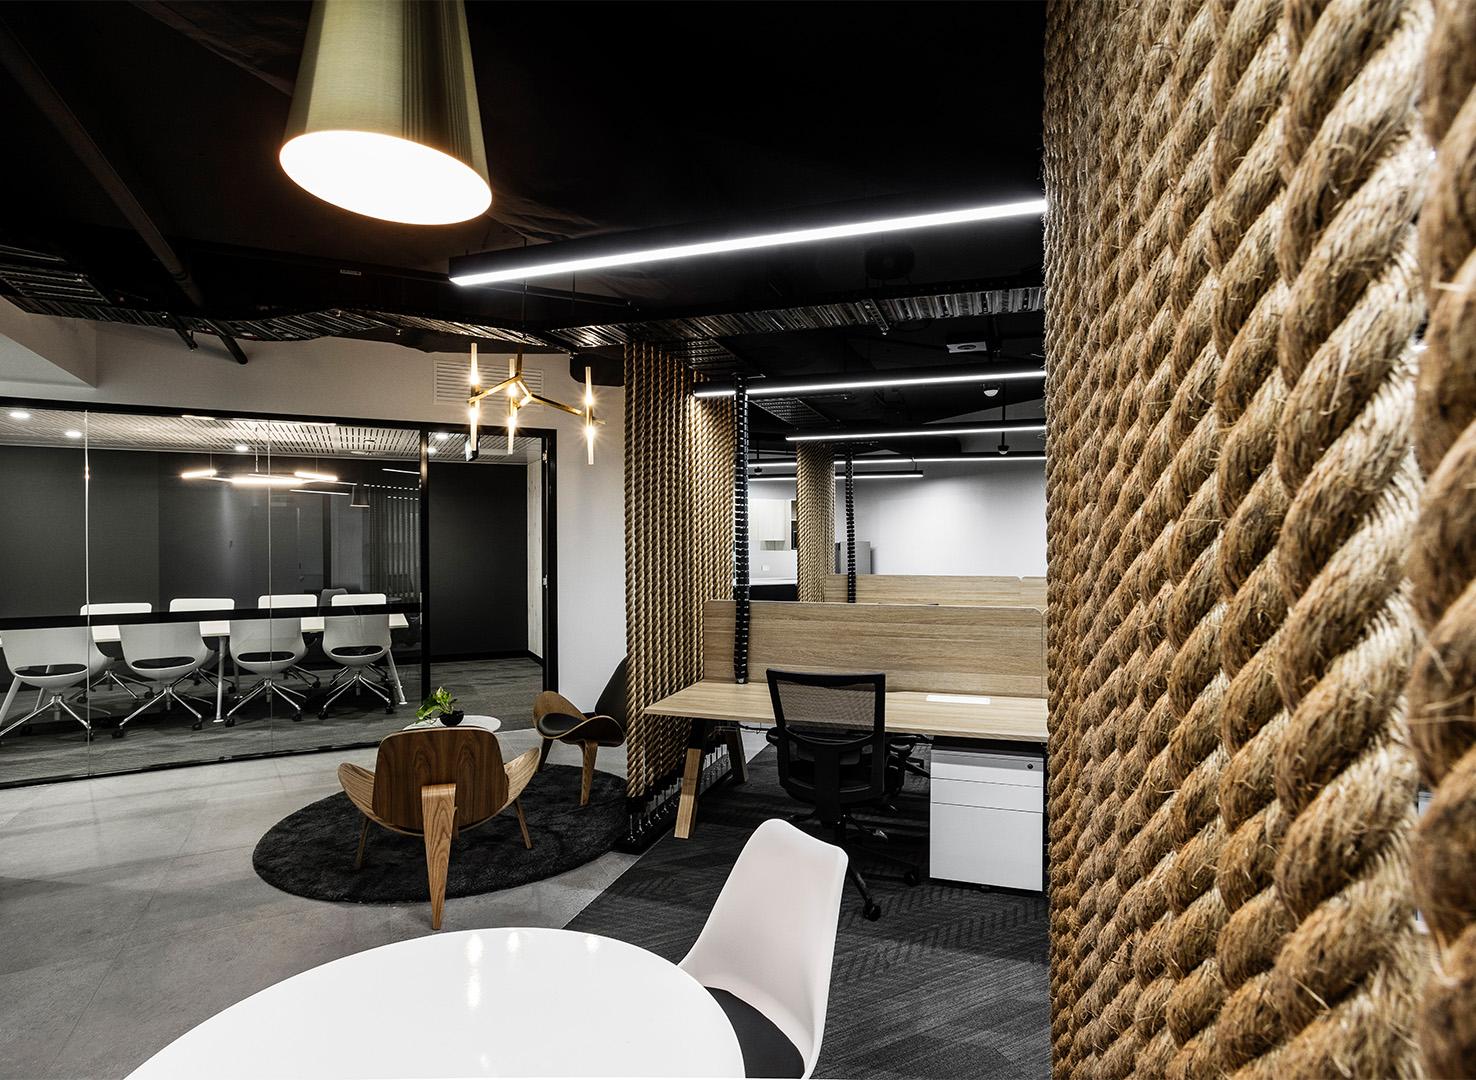 Archway - Quadra - T1 - Workstations.jpg